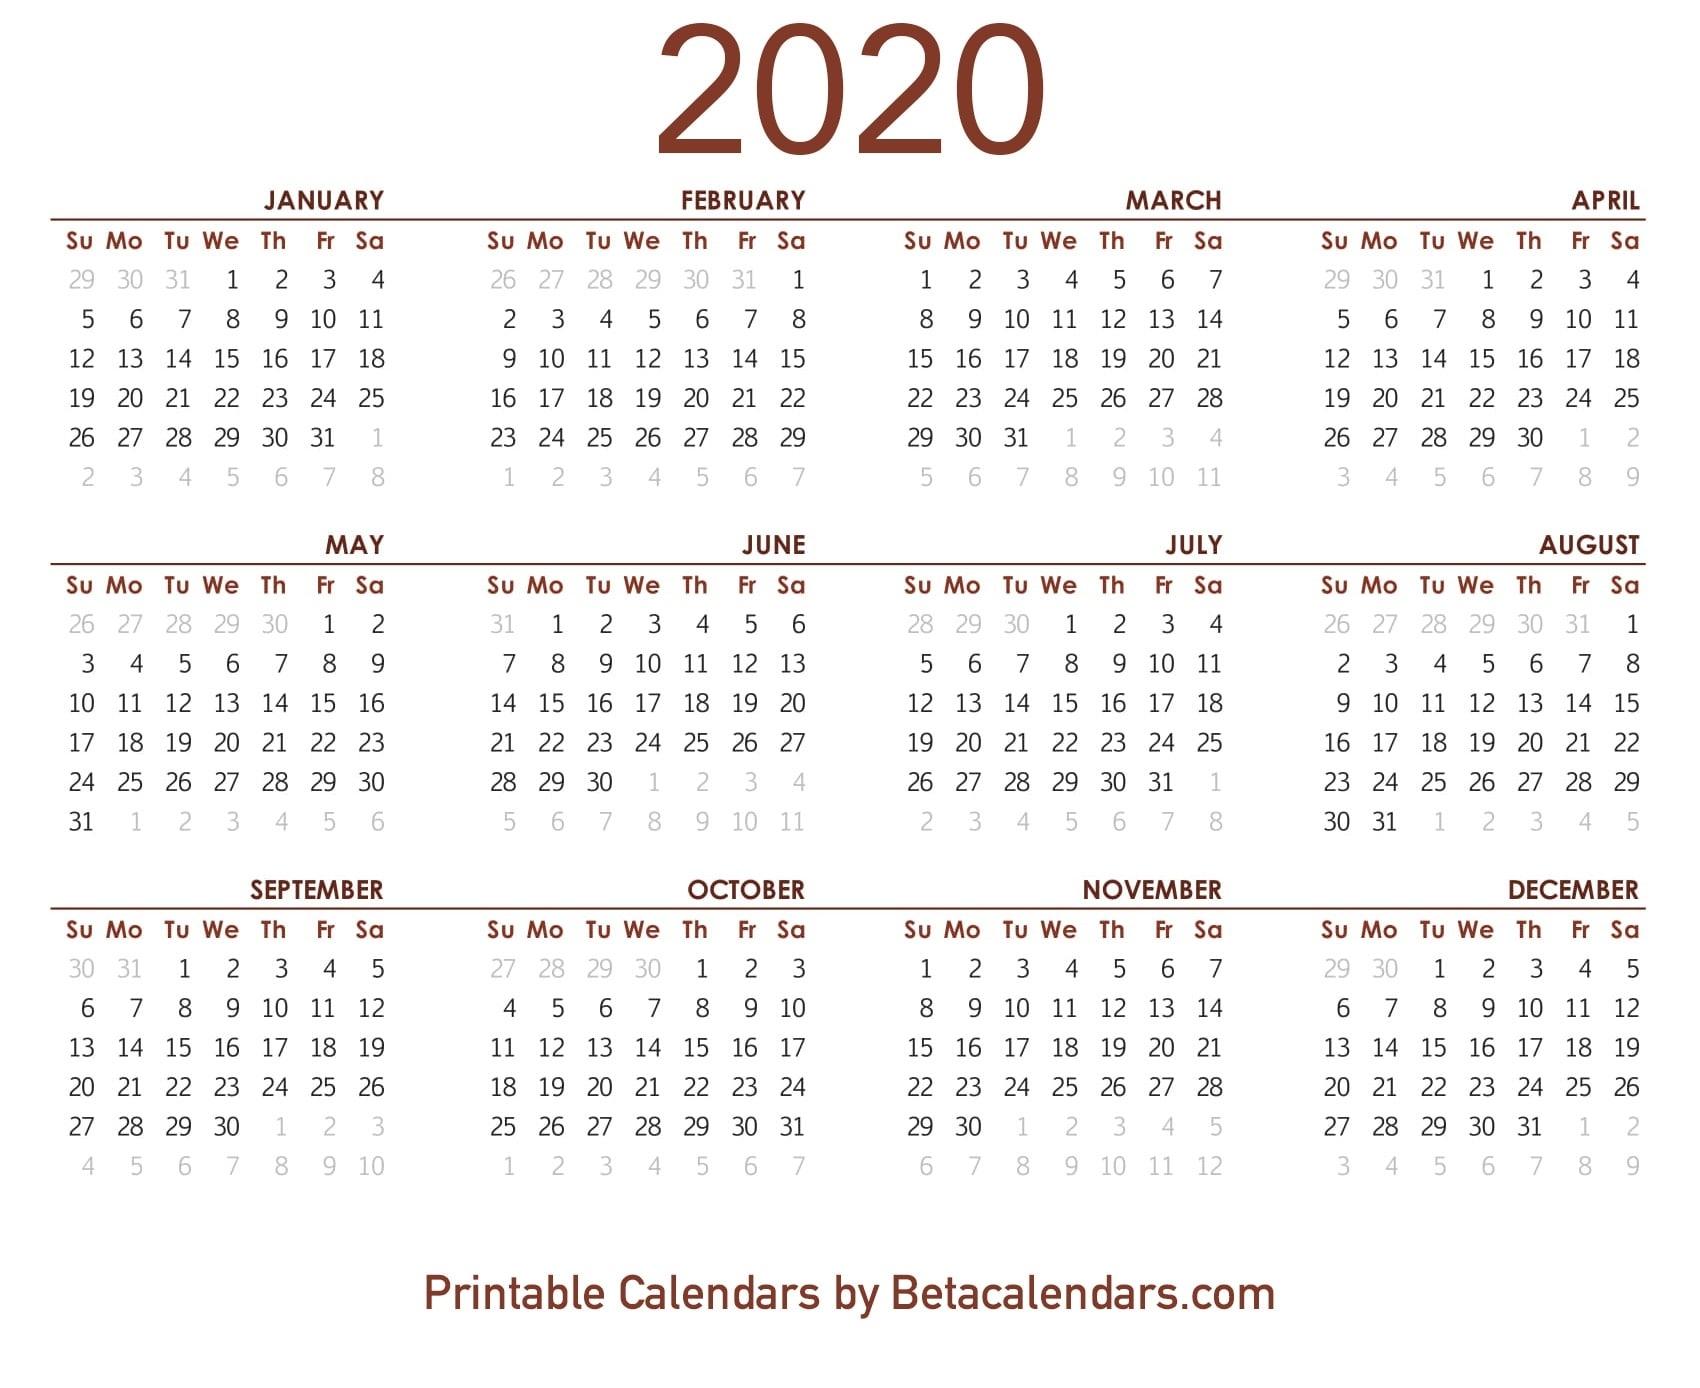 2020 Calendar - Free Printable Yearly Calendar 2020